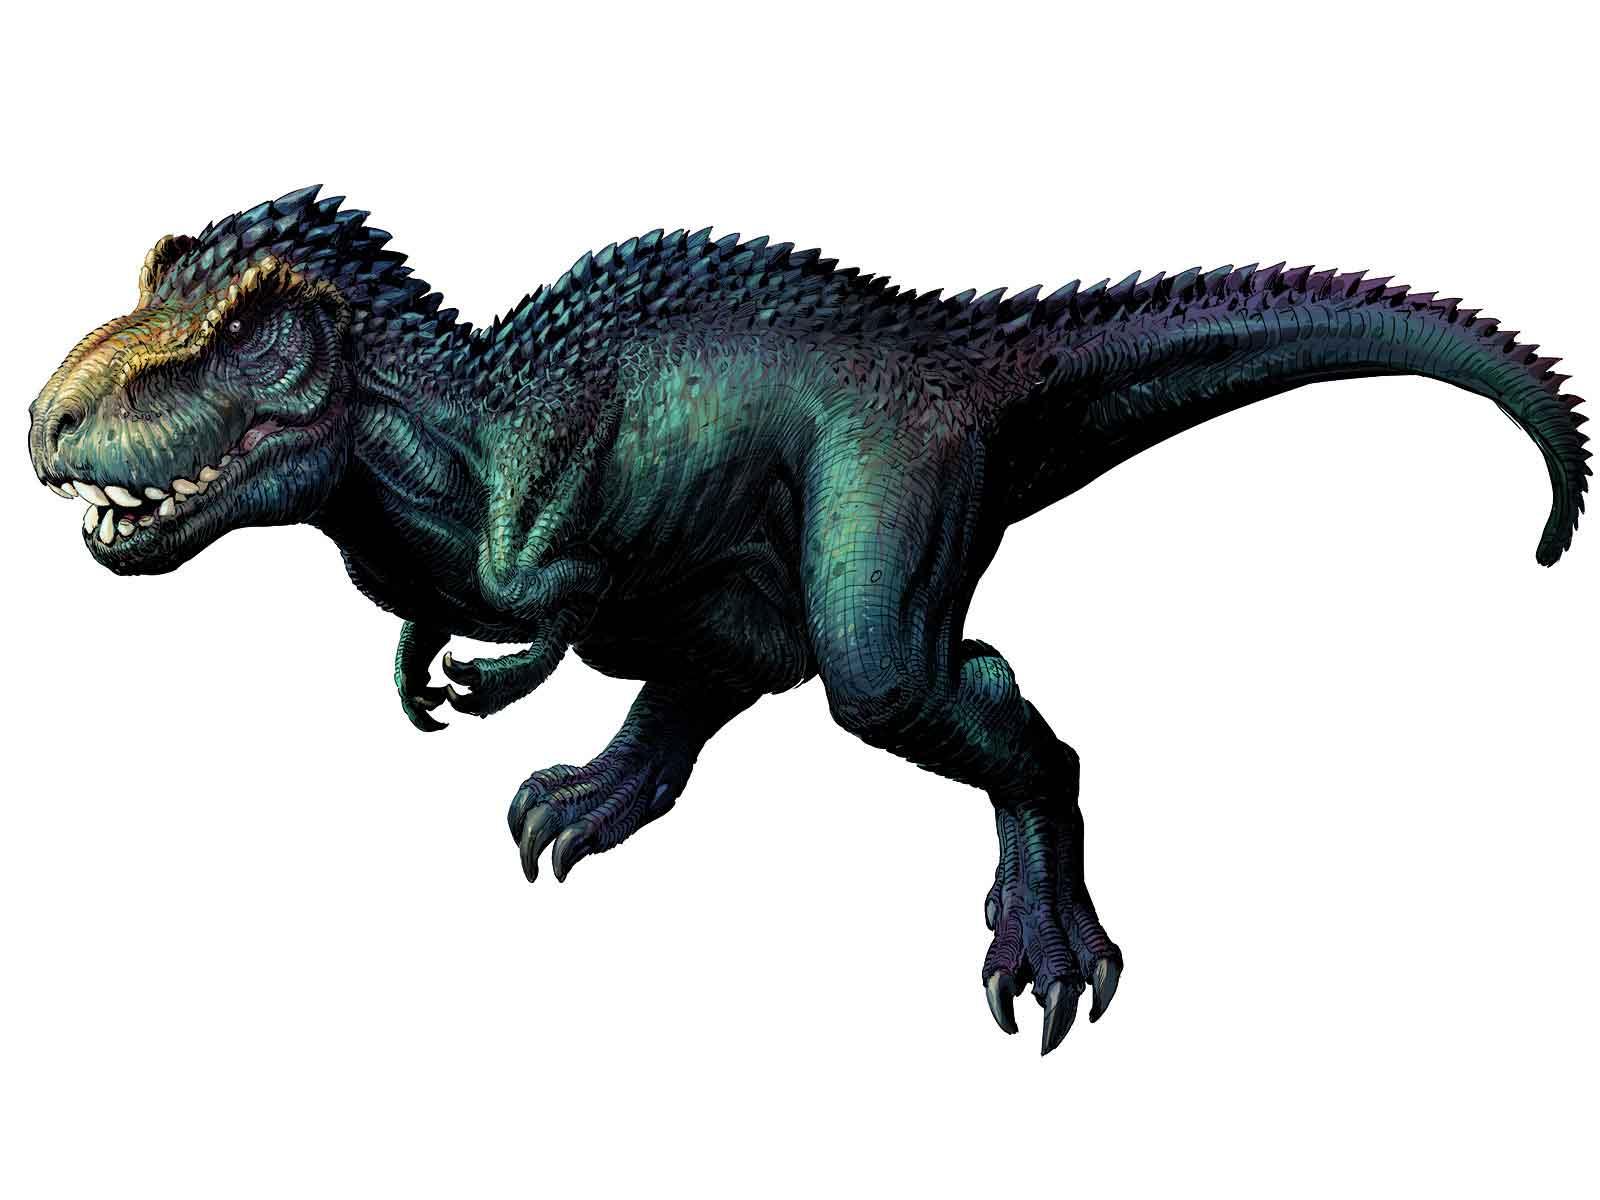 Dynamite 174 Barry Sonnenfeld S Dinosaurs Vs Aliens Hc